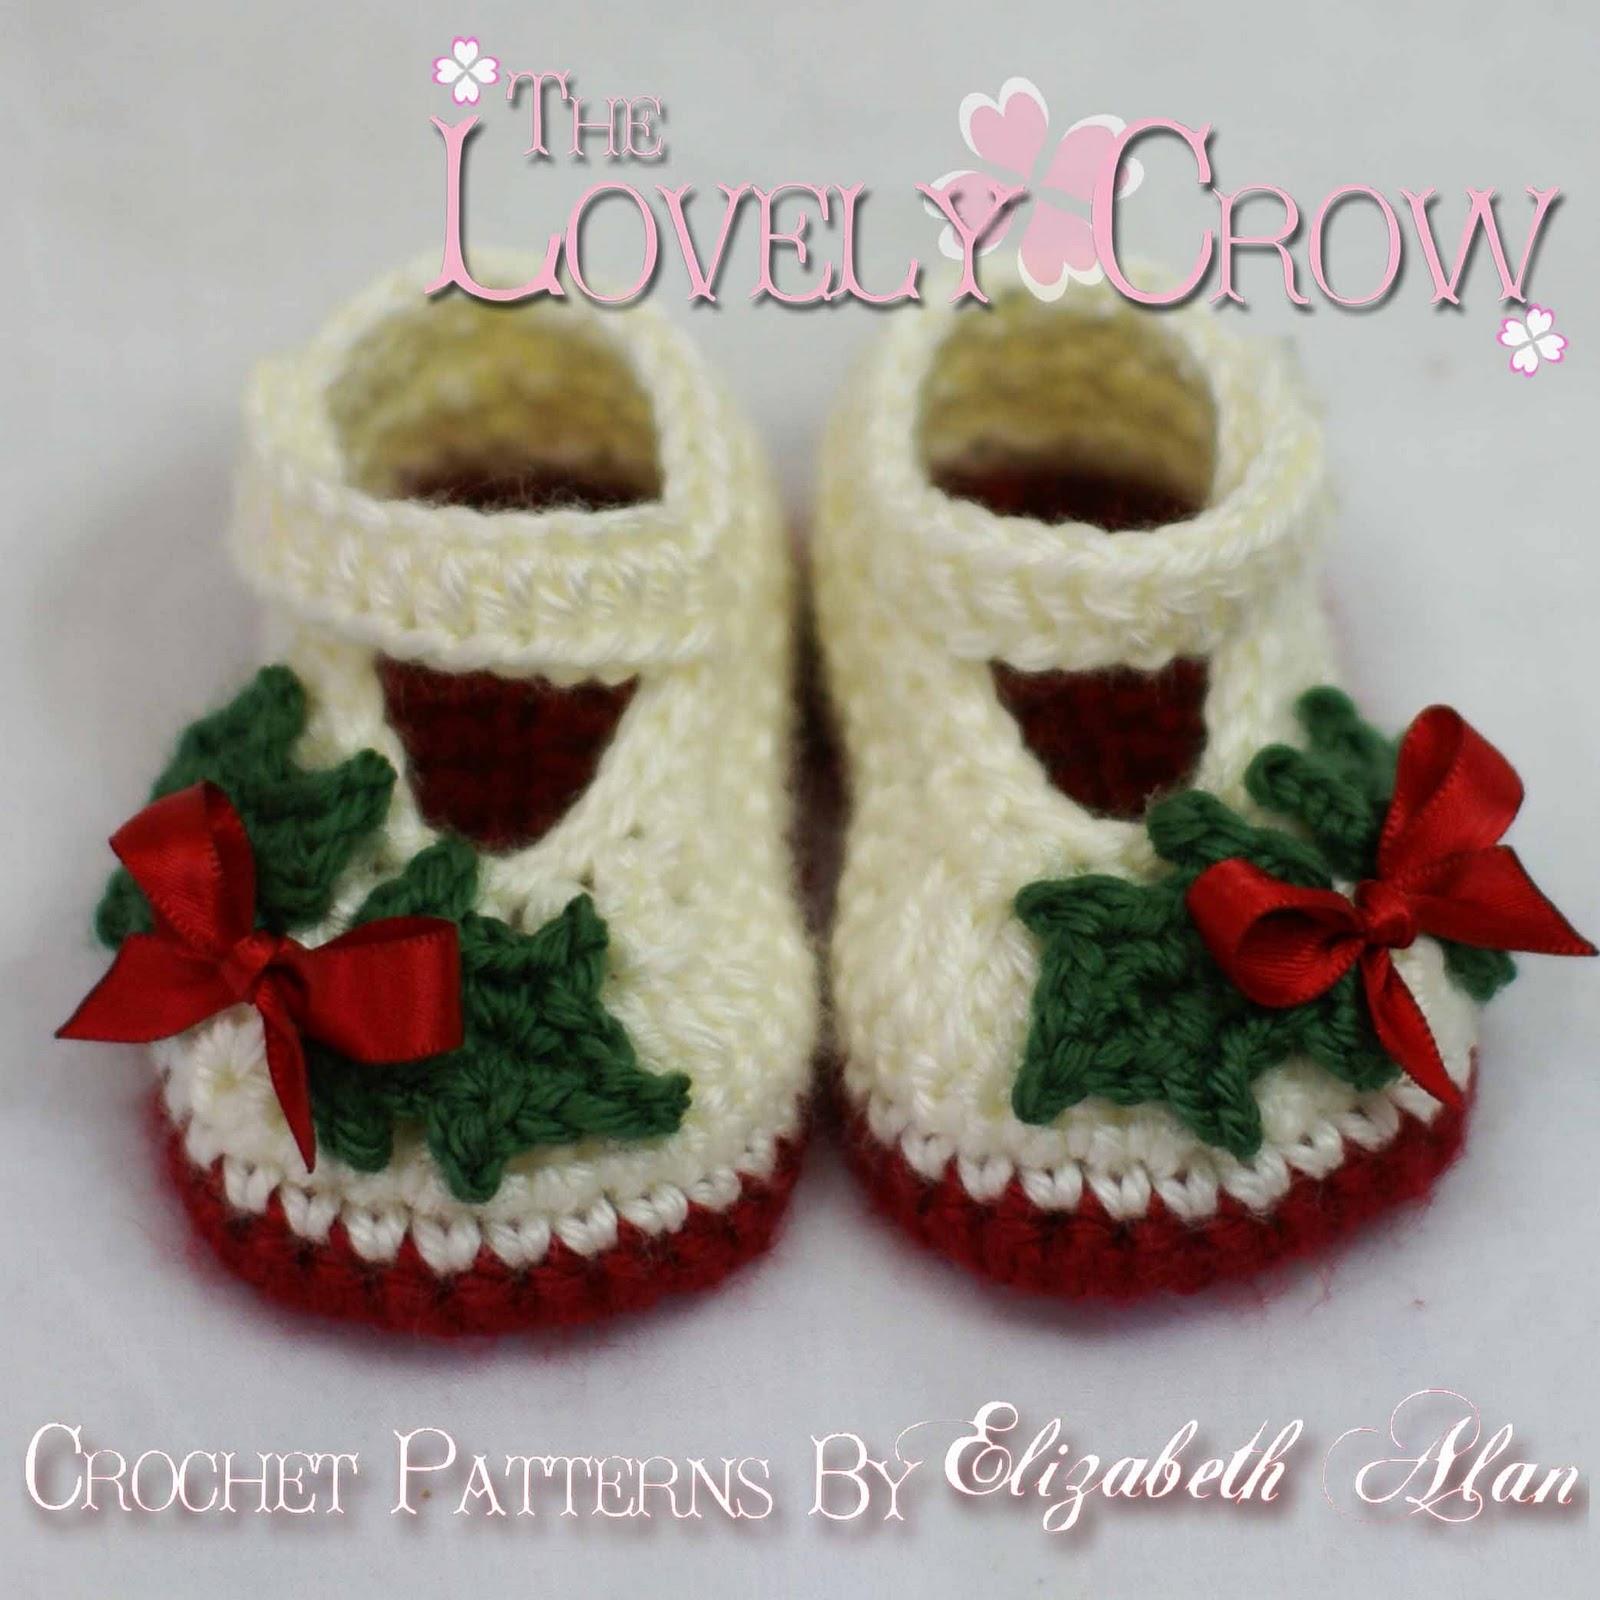 Shoe-torial - Crochet Me